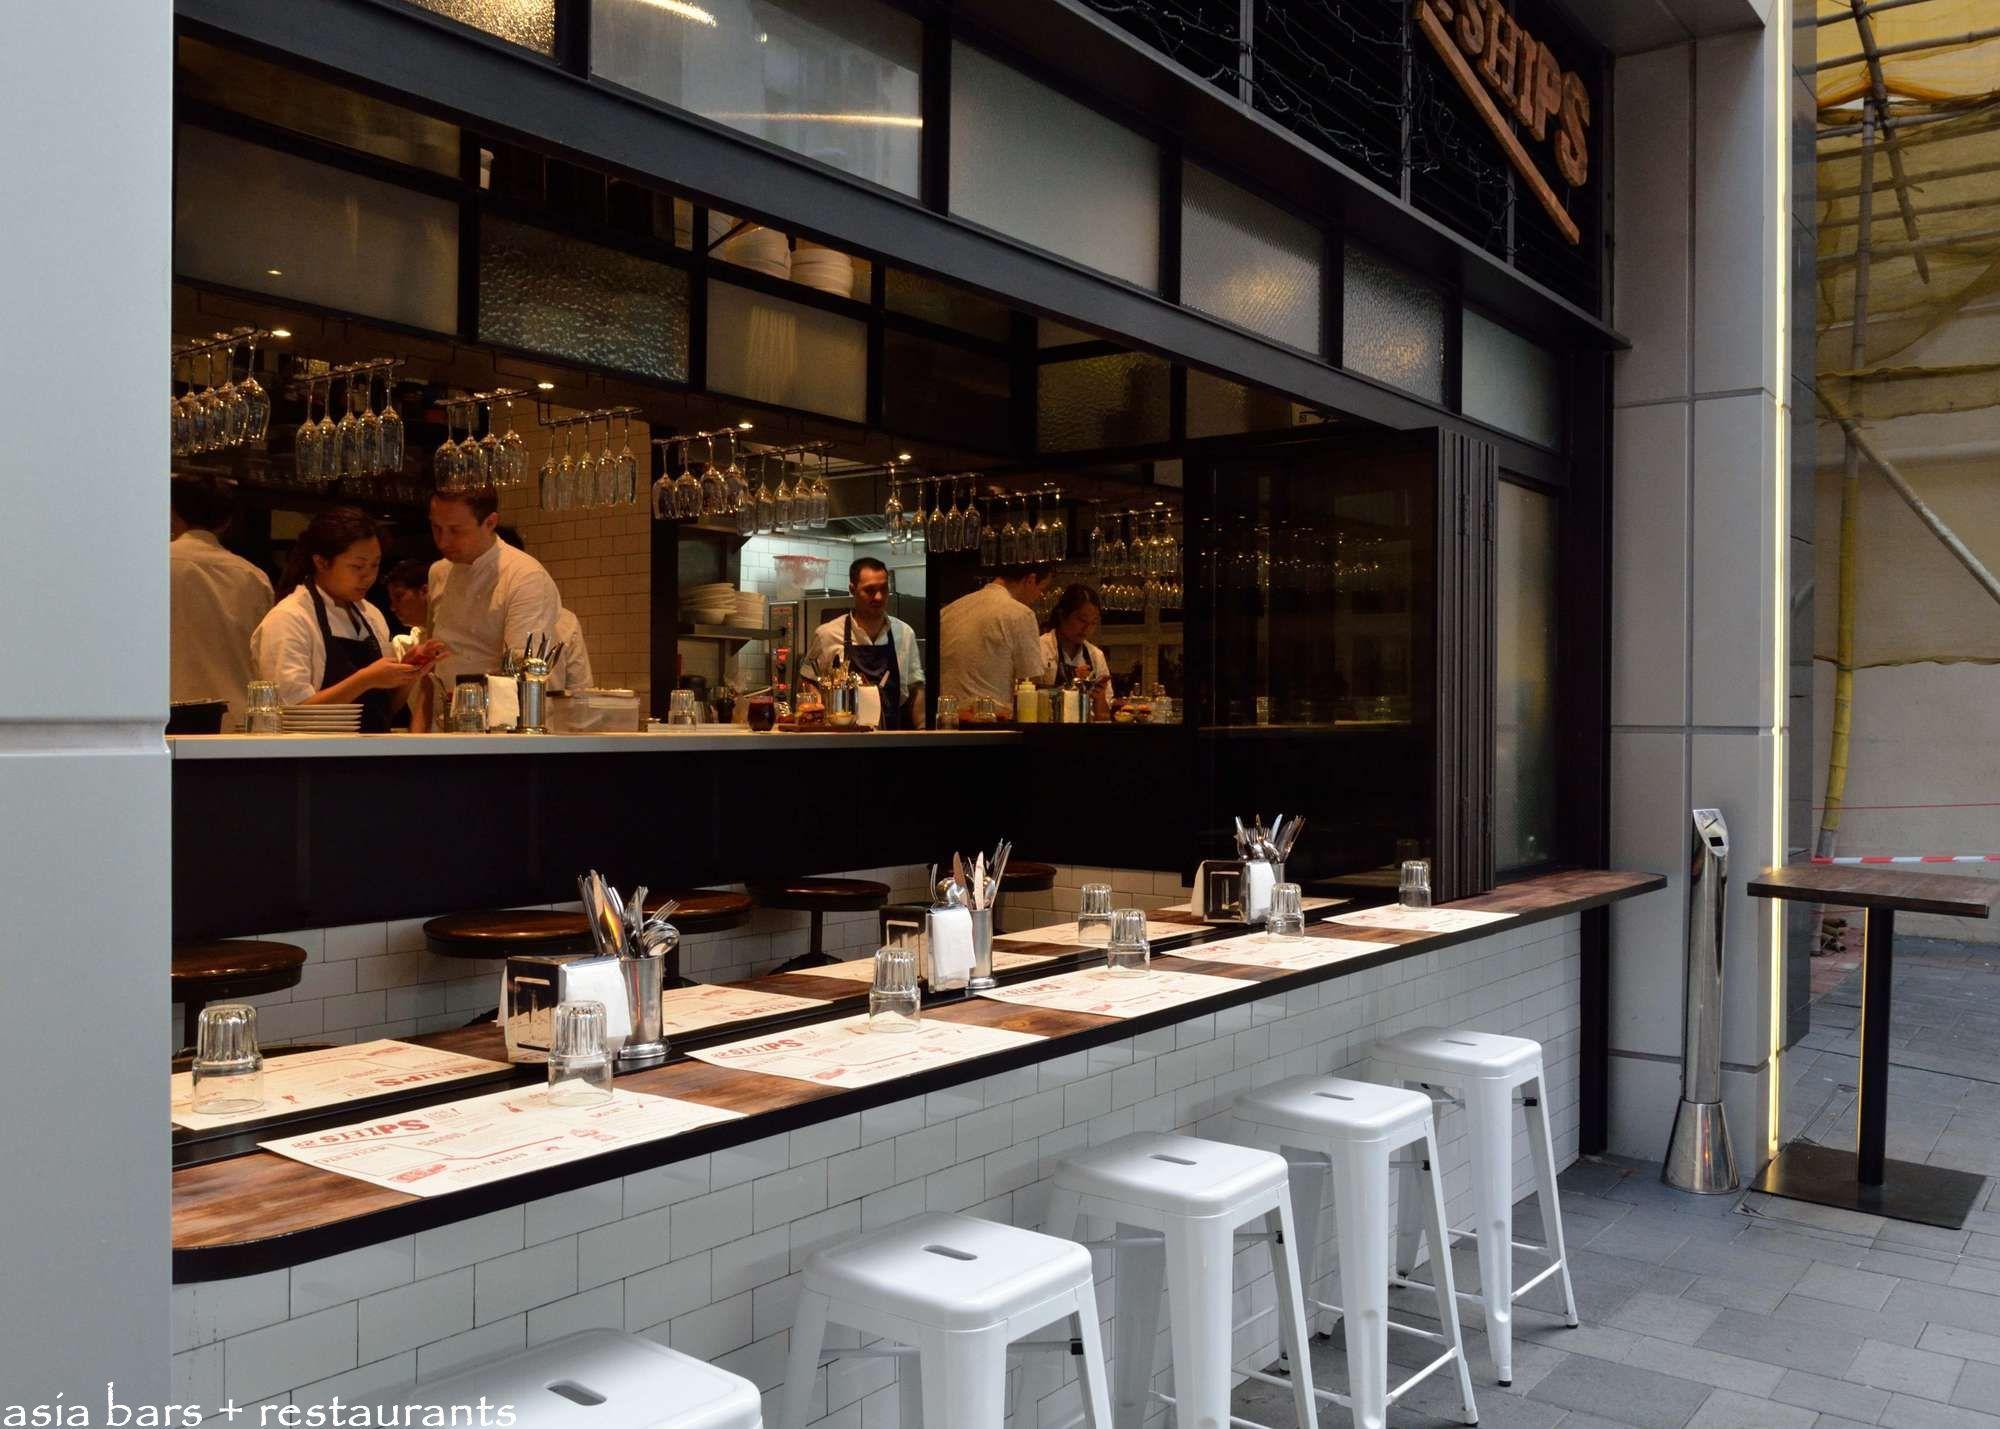 22 Ships- modern tapas bar in Hong Kong | Tapas Restaurants ...